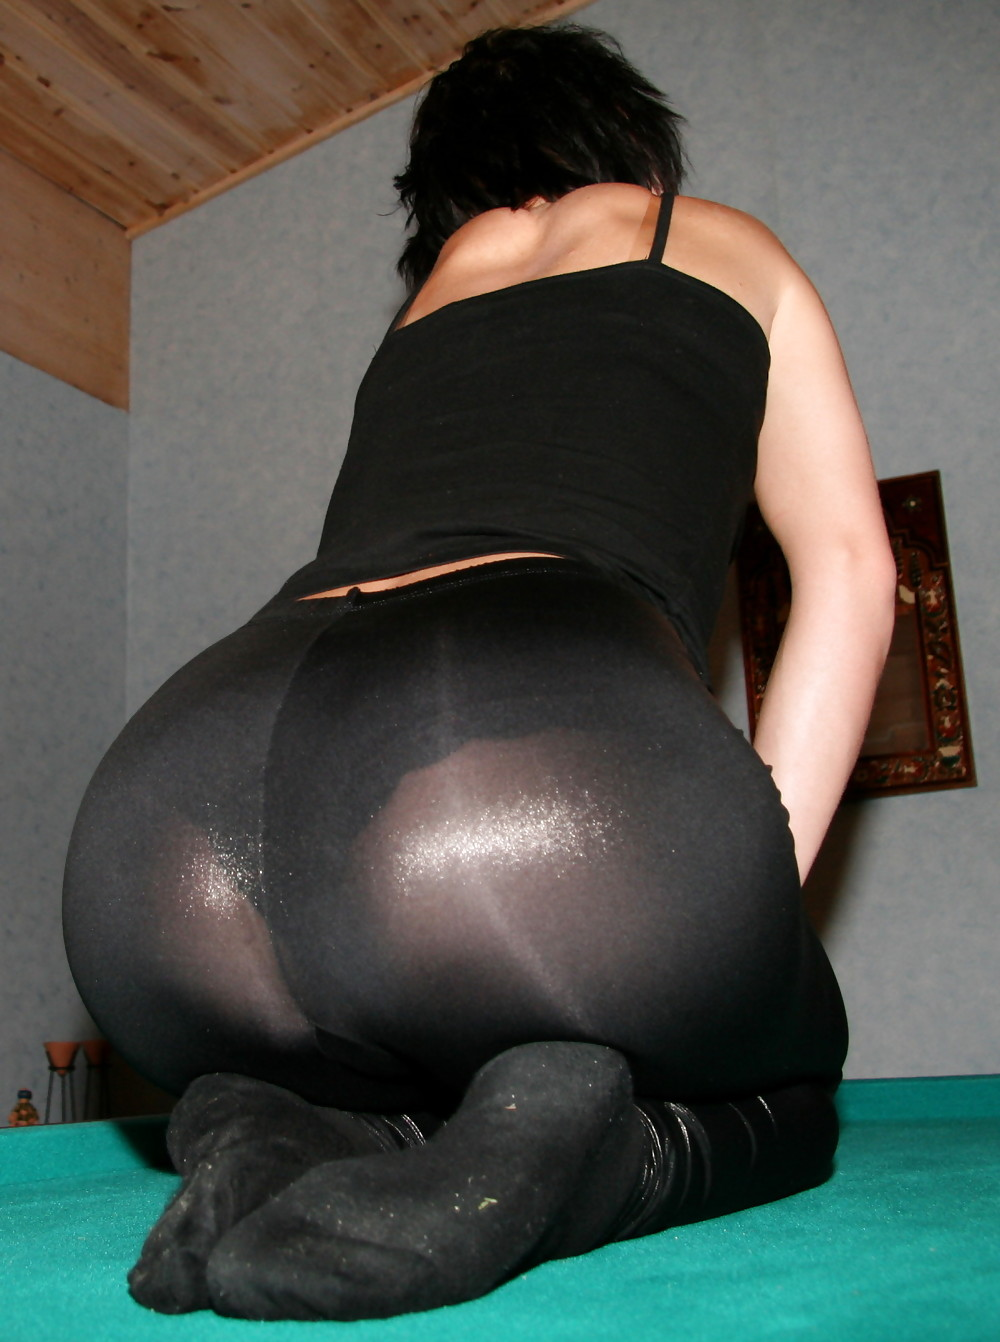 секс картинки толстая жопа в штанах